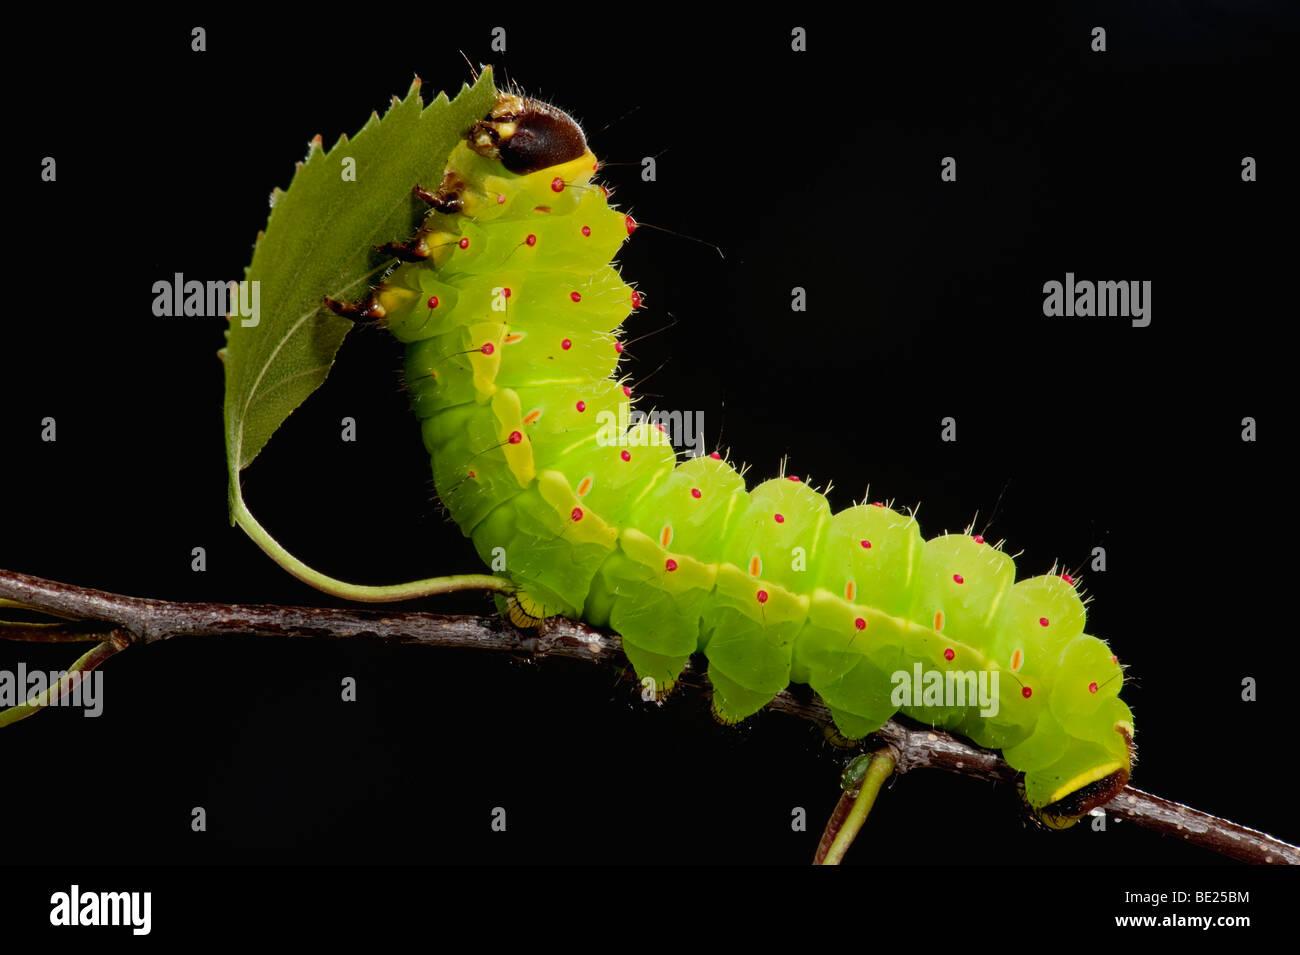 Luna o Luna Moth Caterpillar Actias luna larve alimentazione su Betulla foglie verde brillante Immagini Stock